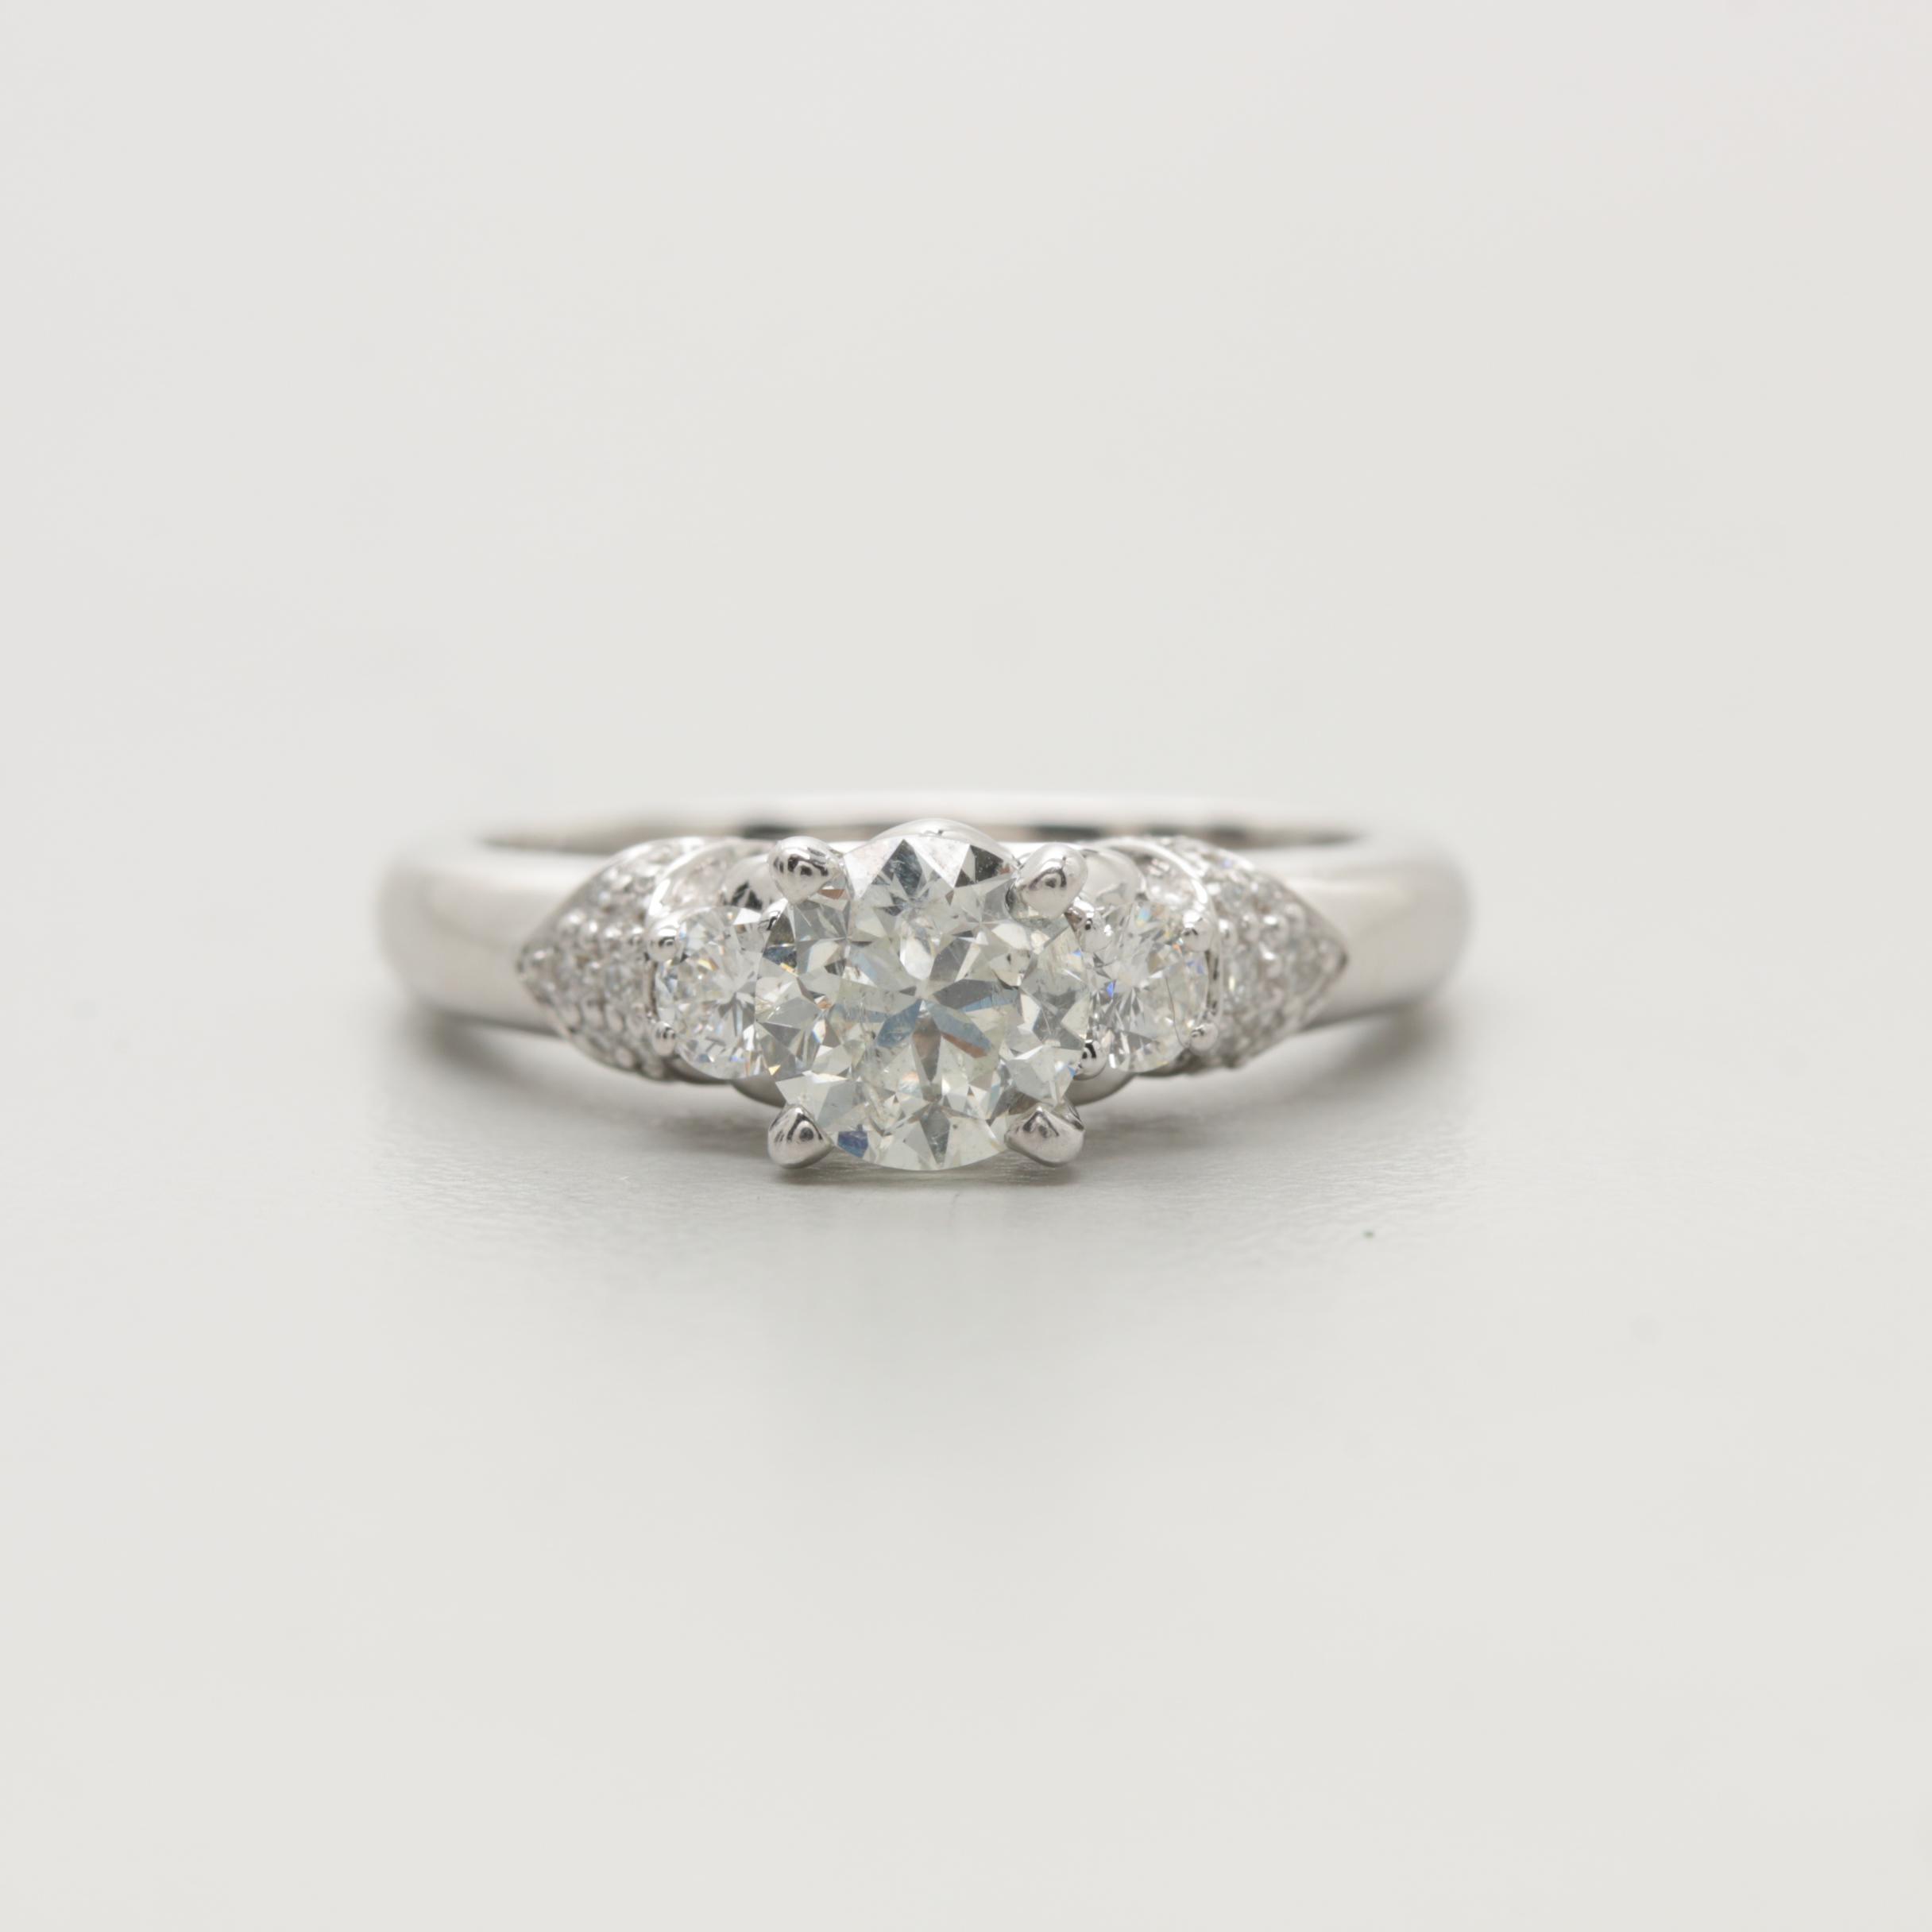 14K White Gold 1.33 CTW Diamond Ring